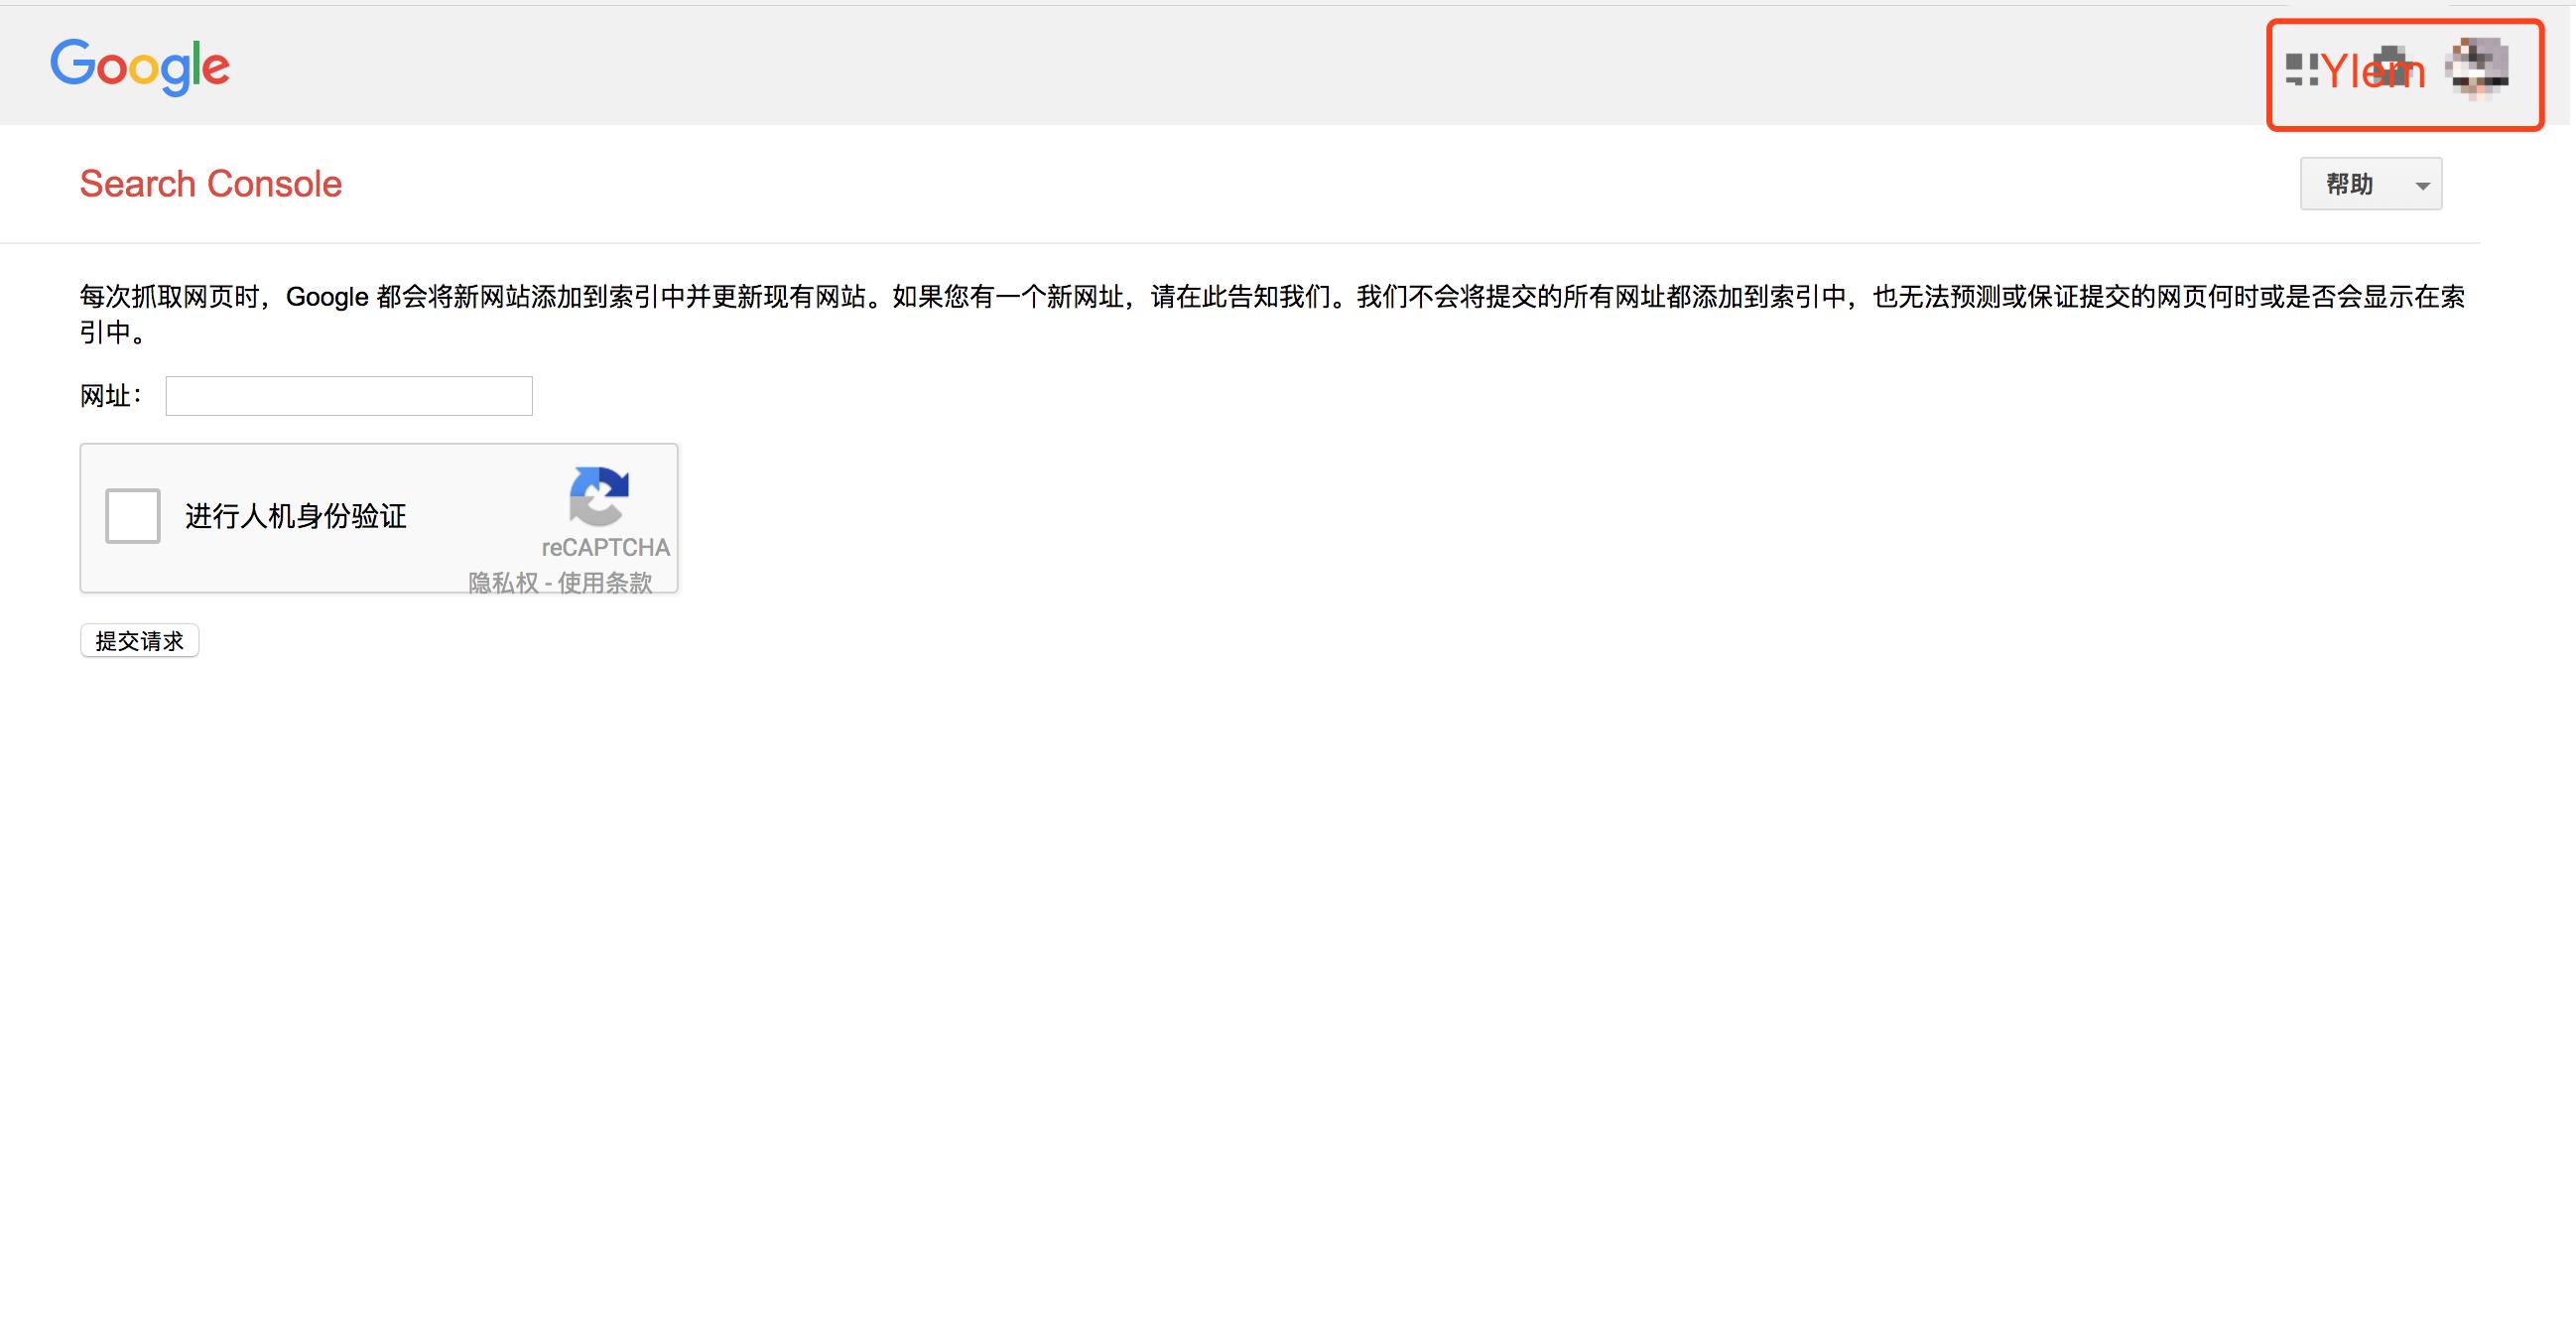 Google WebSite Submit-谷歌网址提交链接